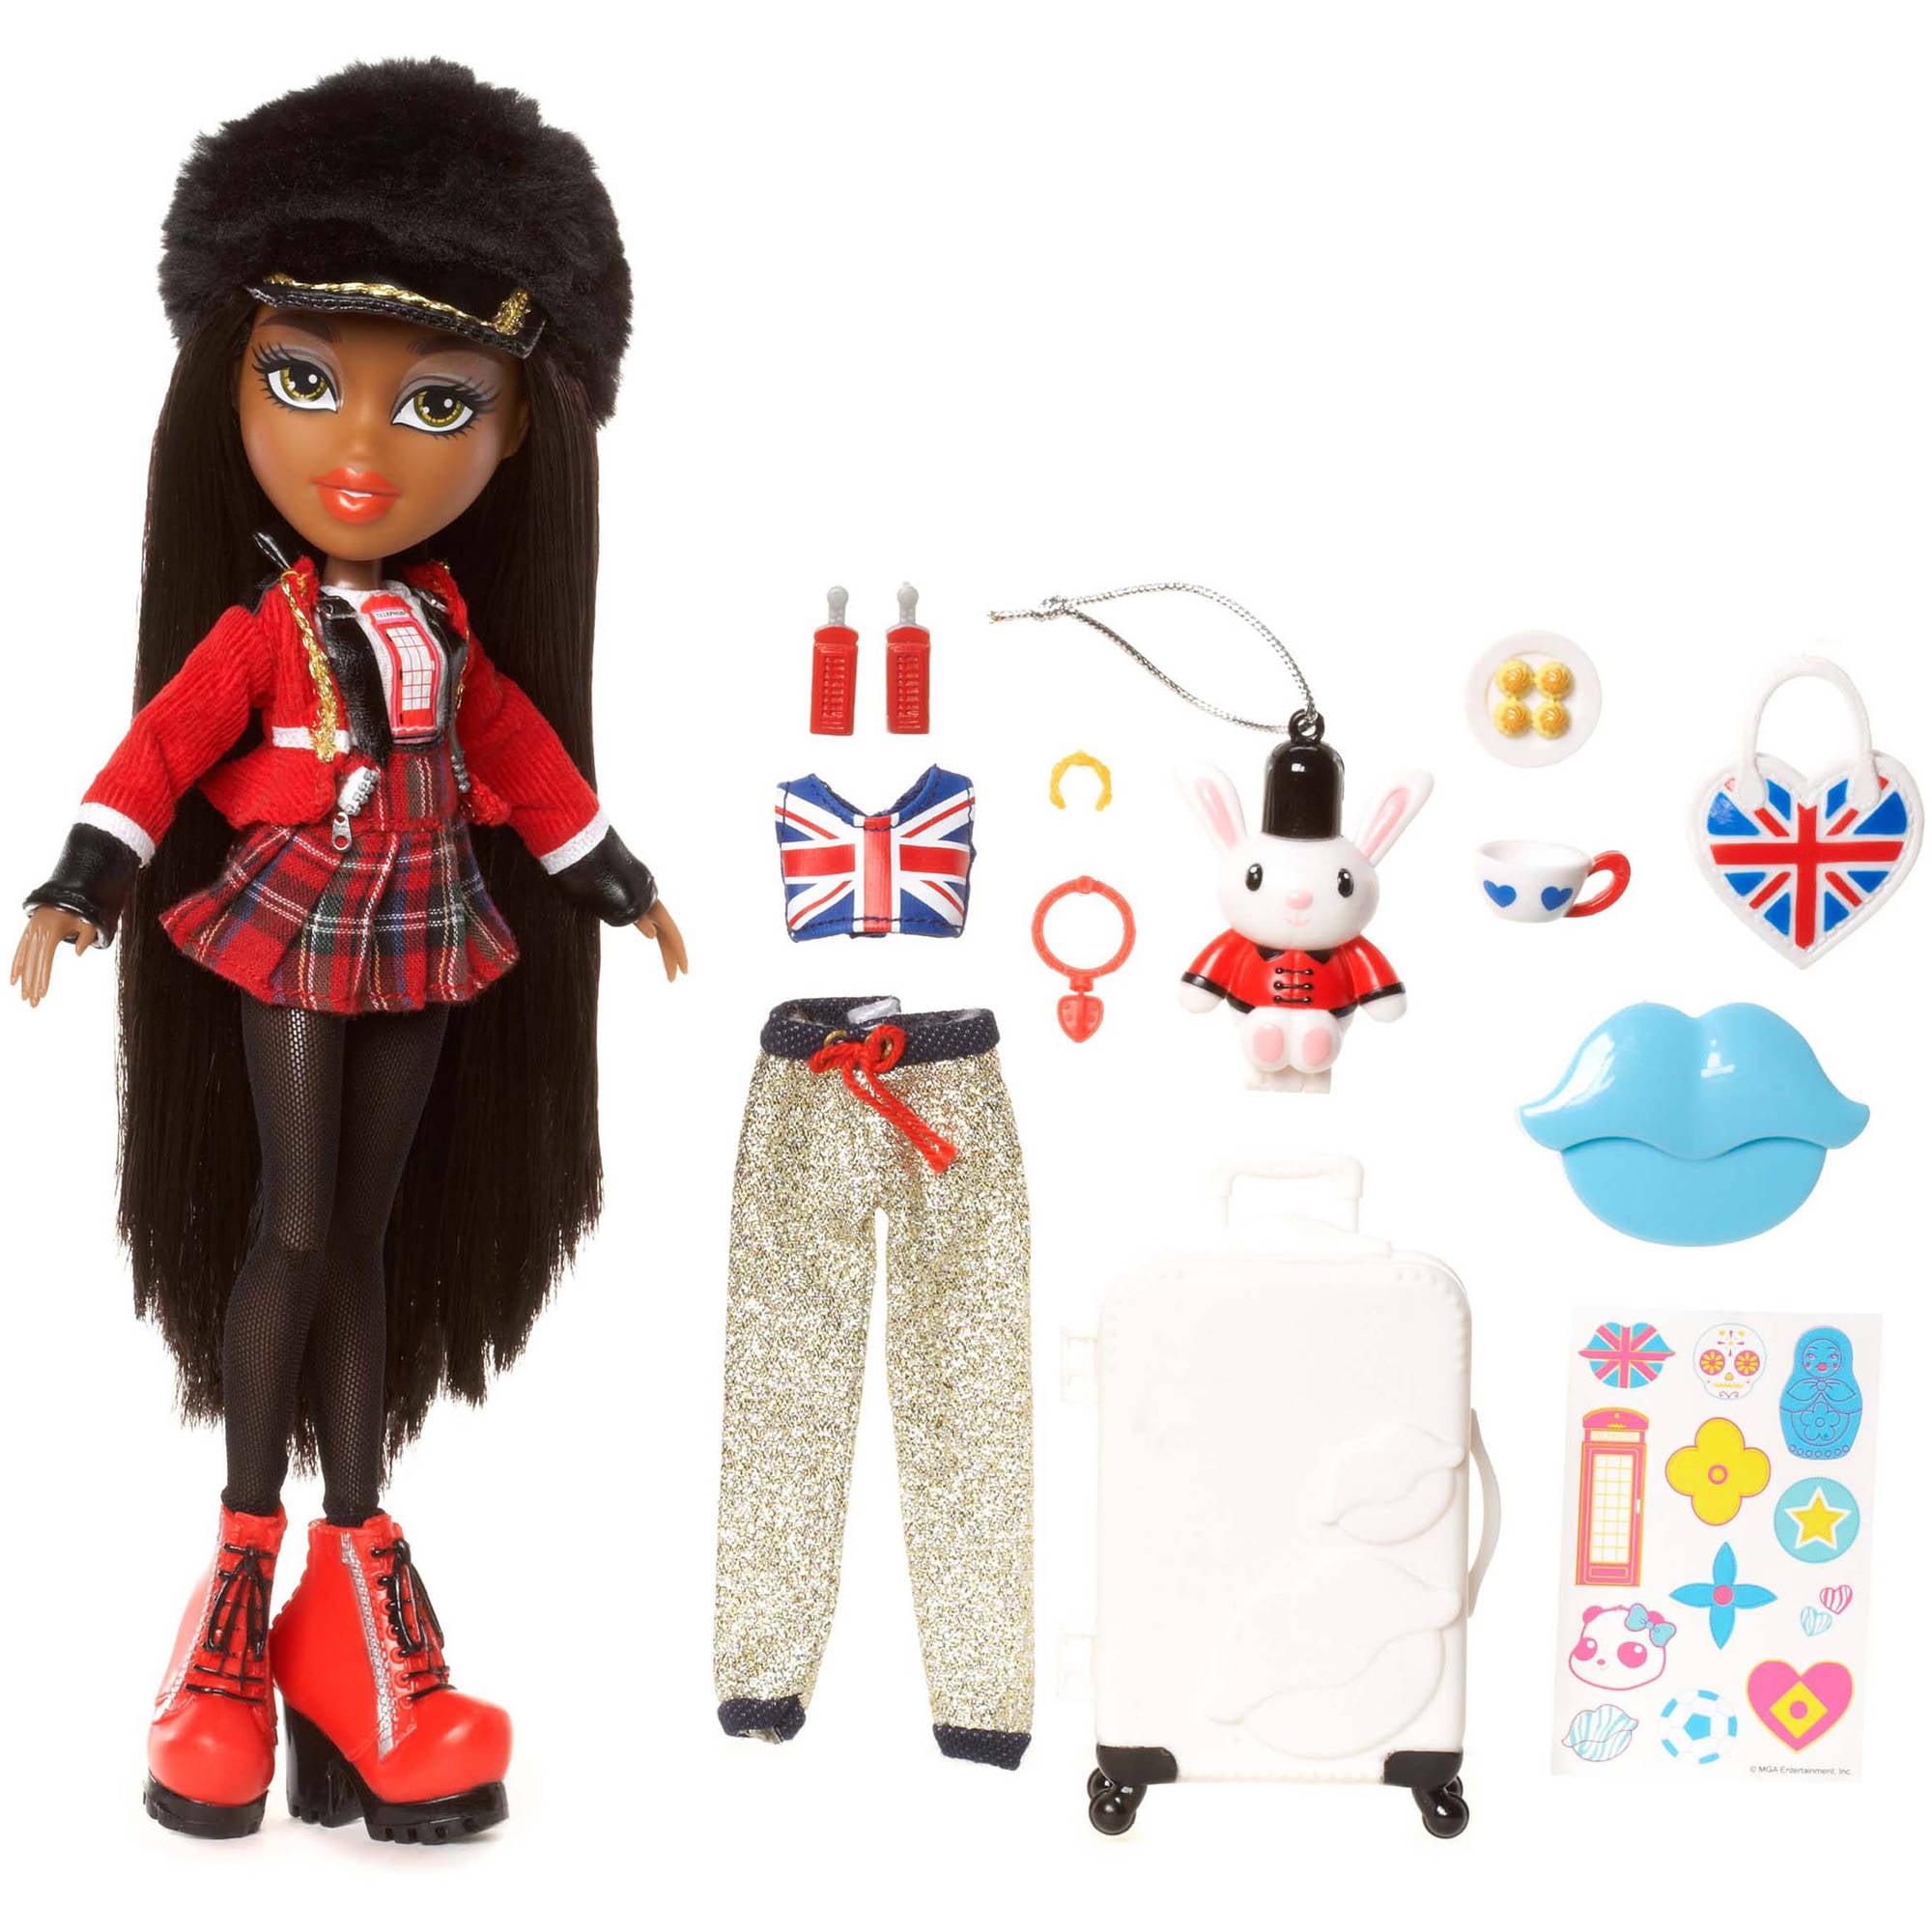 Bratz Study Abroad Doll, Sasha to UK by MGA Entertainment